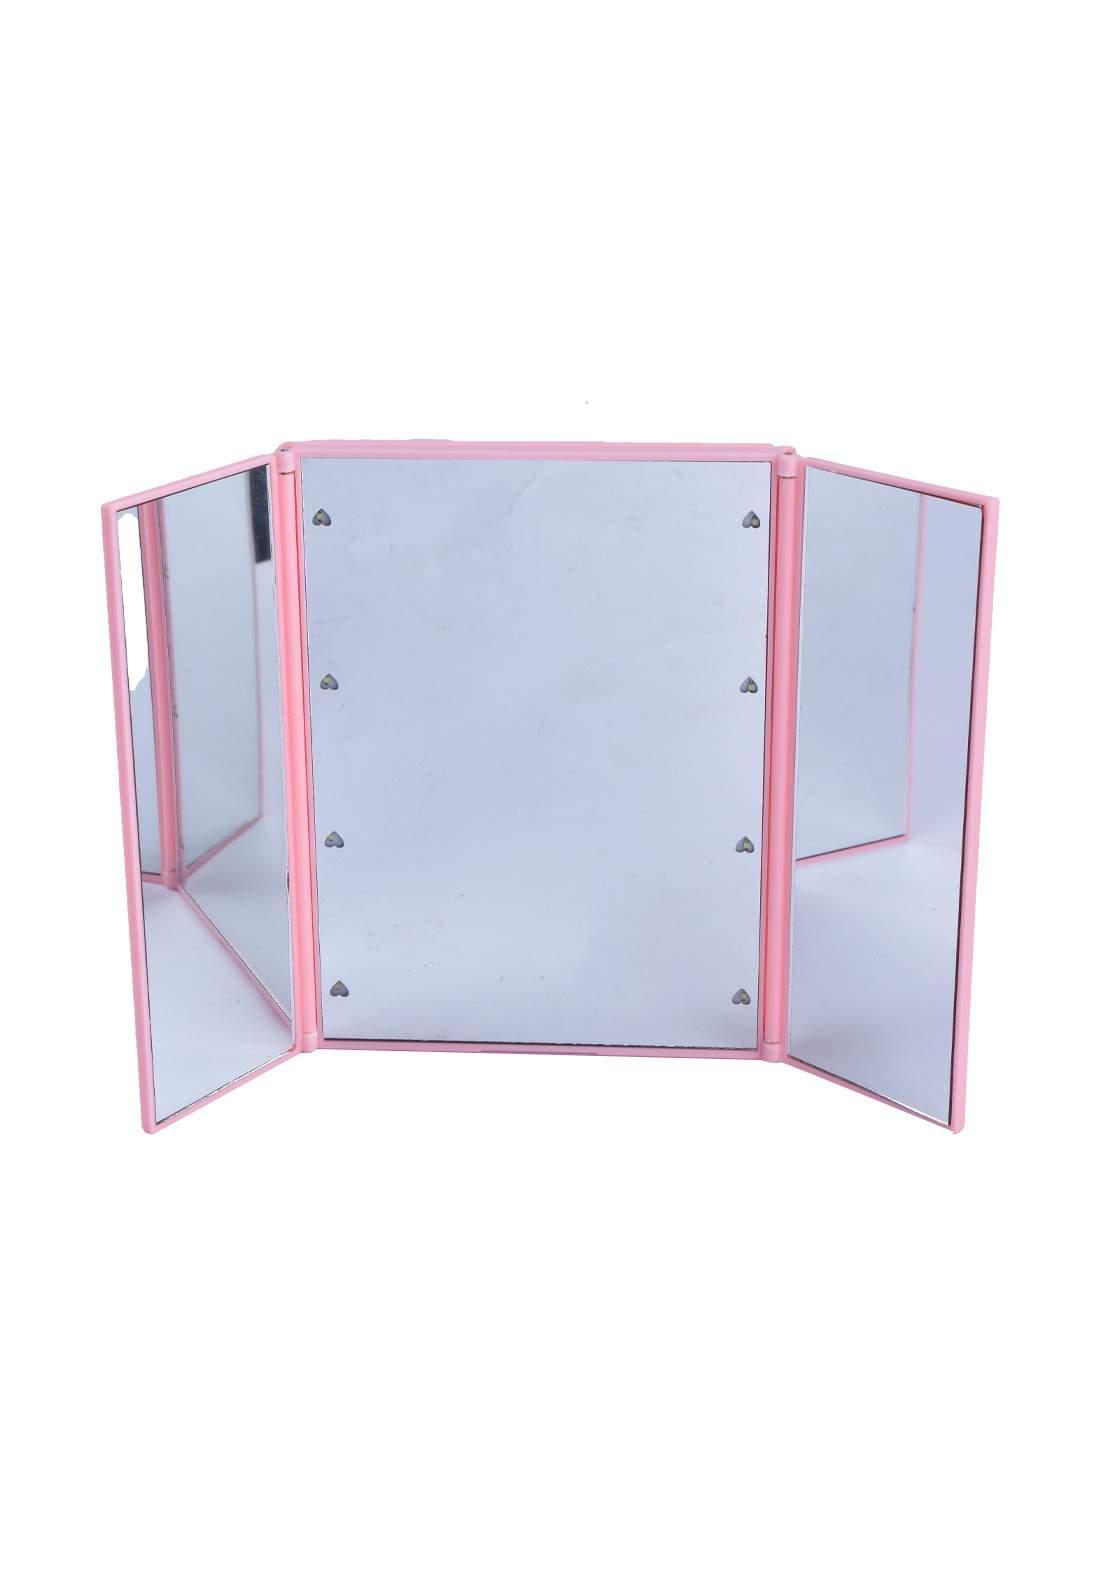 Foldable Cosmetic Mirror With Led  مرآة  قابلة للدوران مع انارة ضوئية